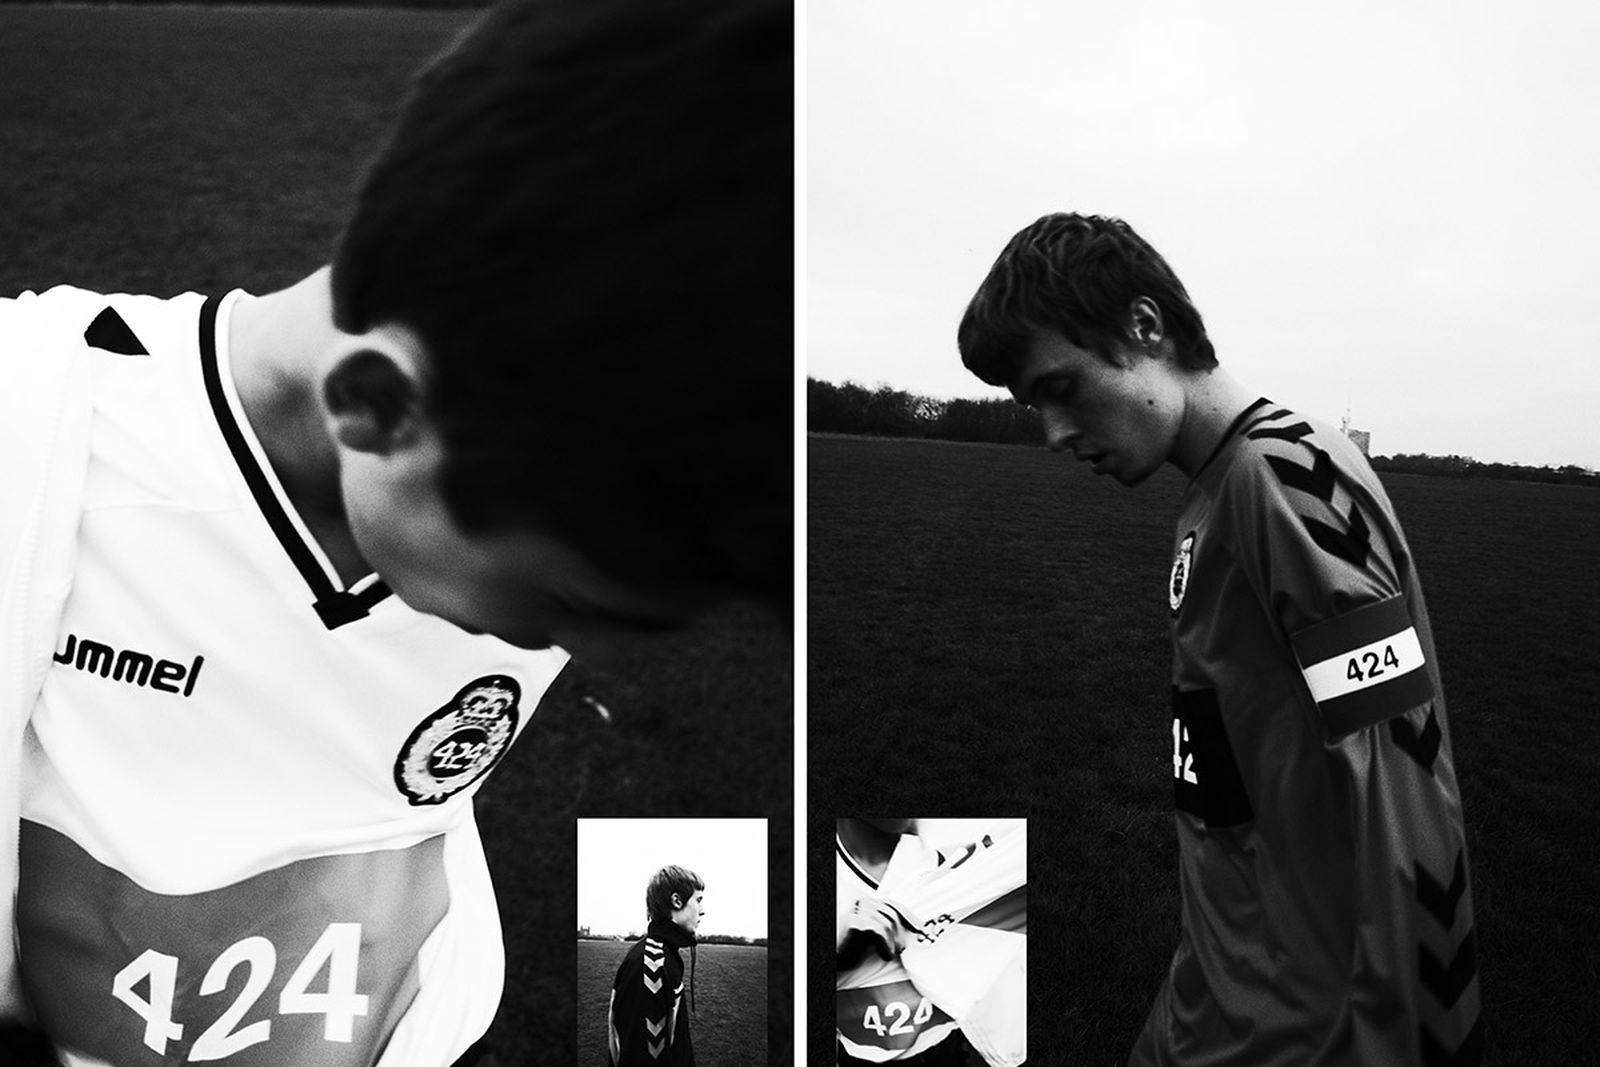 hummel-424-soccer-capsule-02